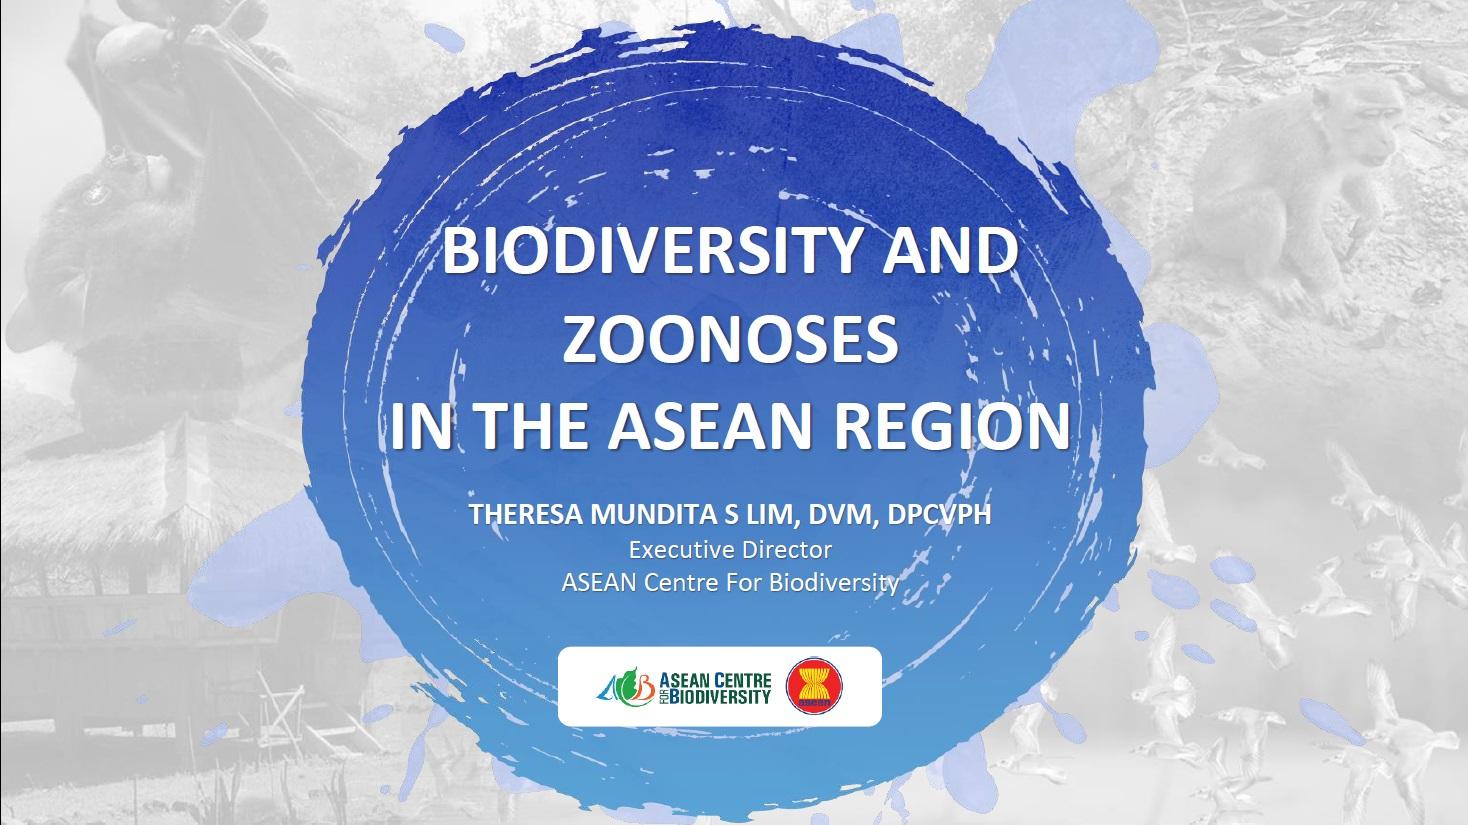 Biodiversity and Zoonosis